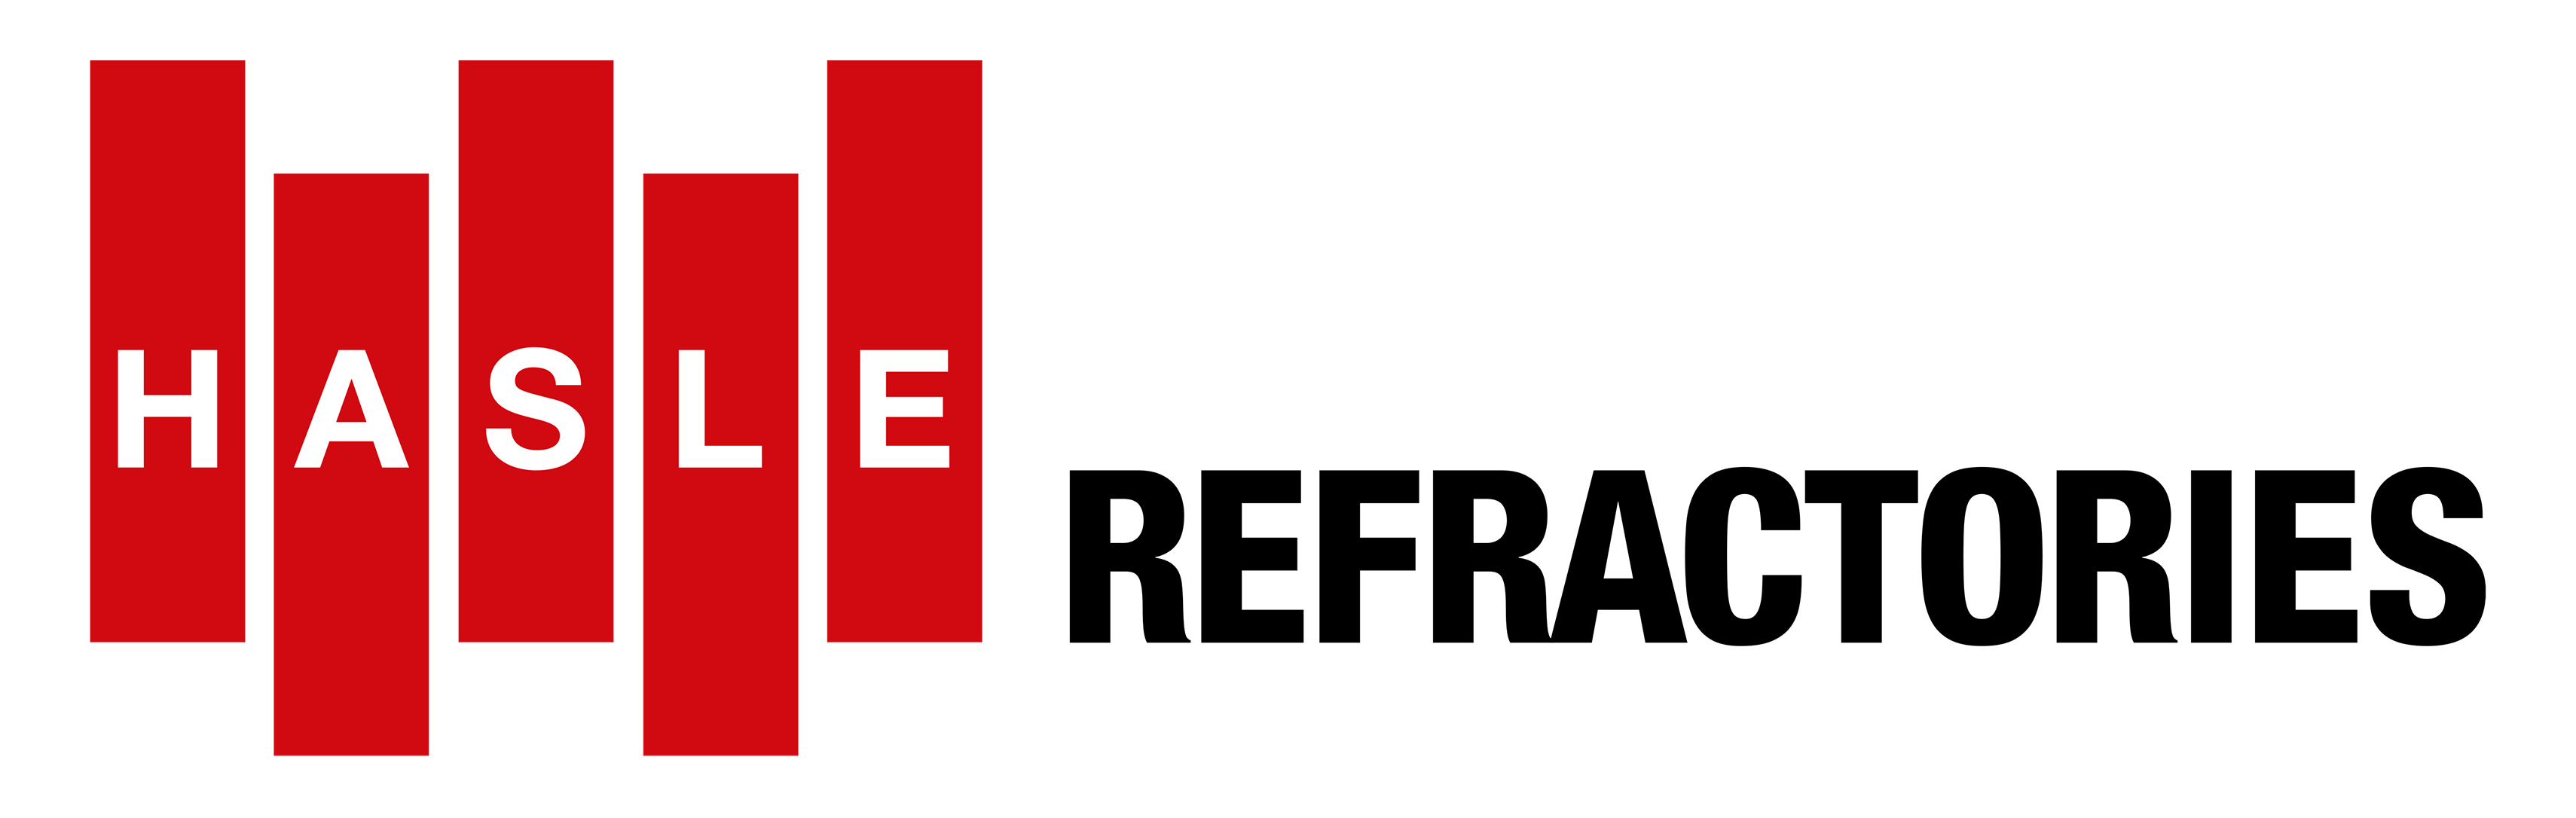 Hasle Refractories